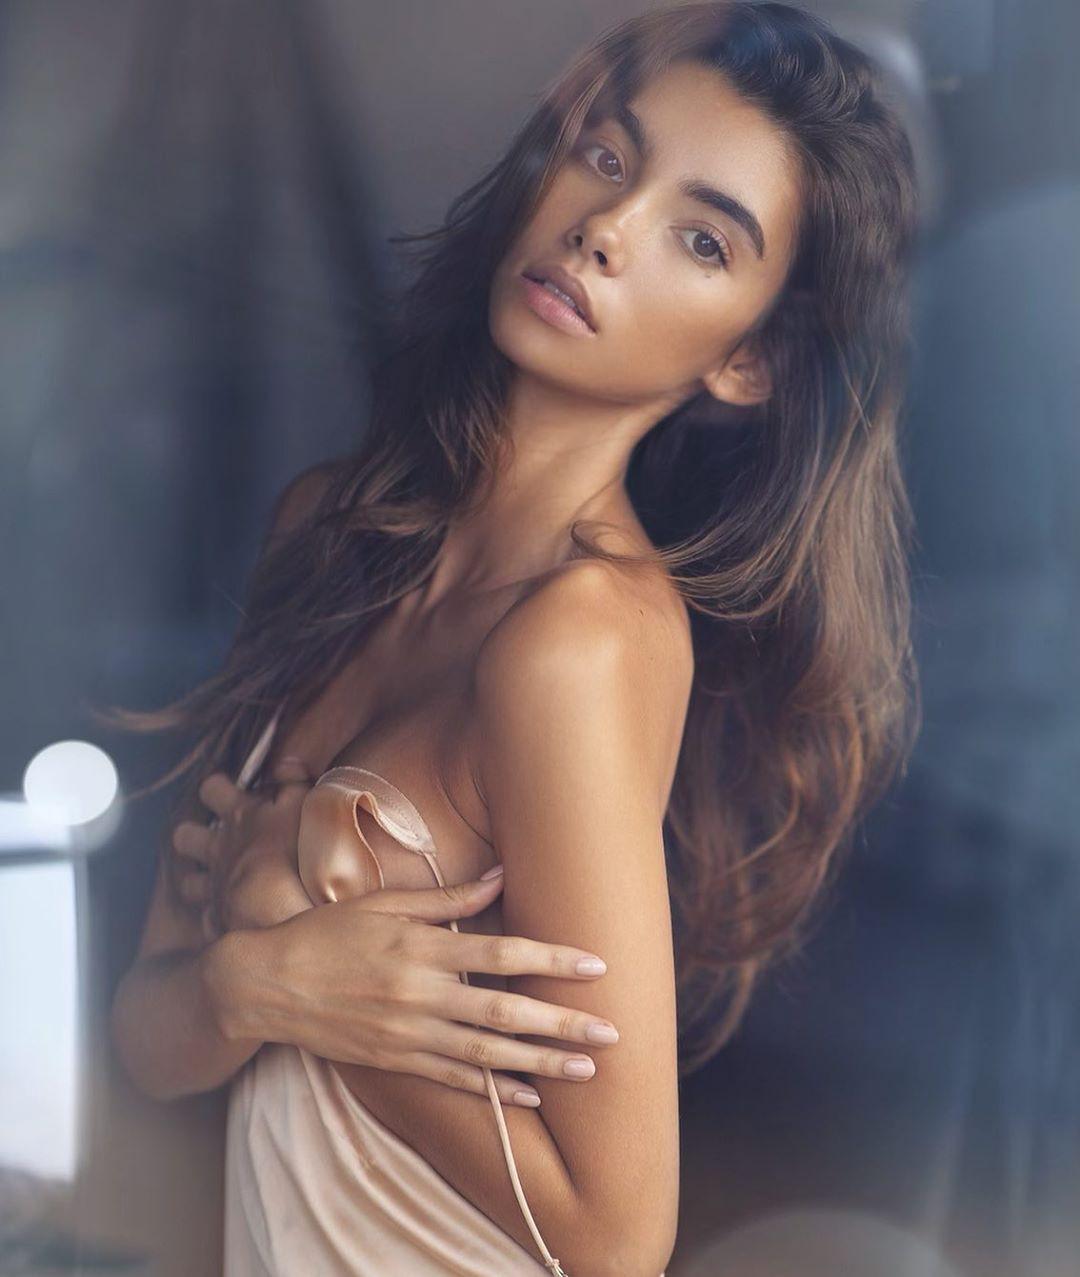 Cindy Mello photoshoot ideas, Glossy Lips, Long Hair Girl